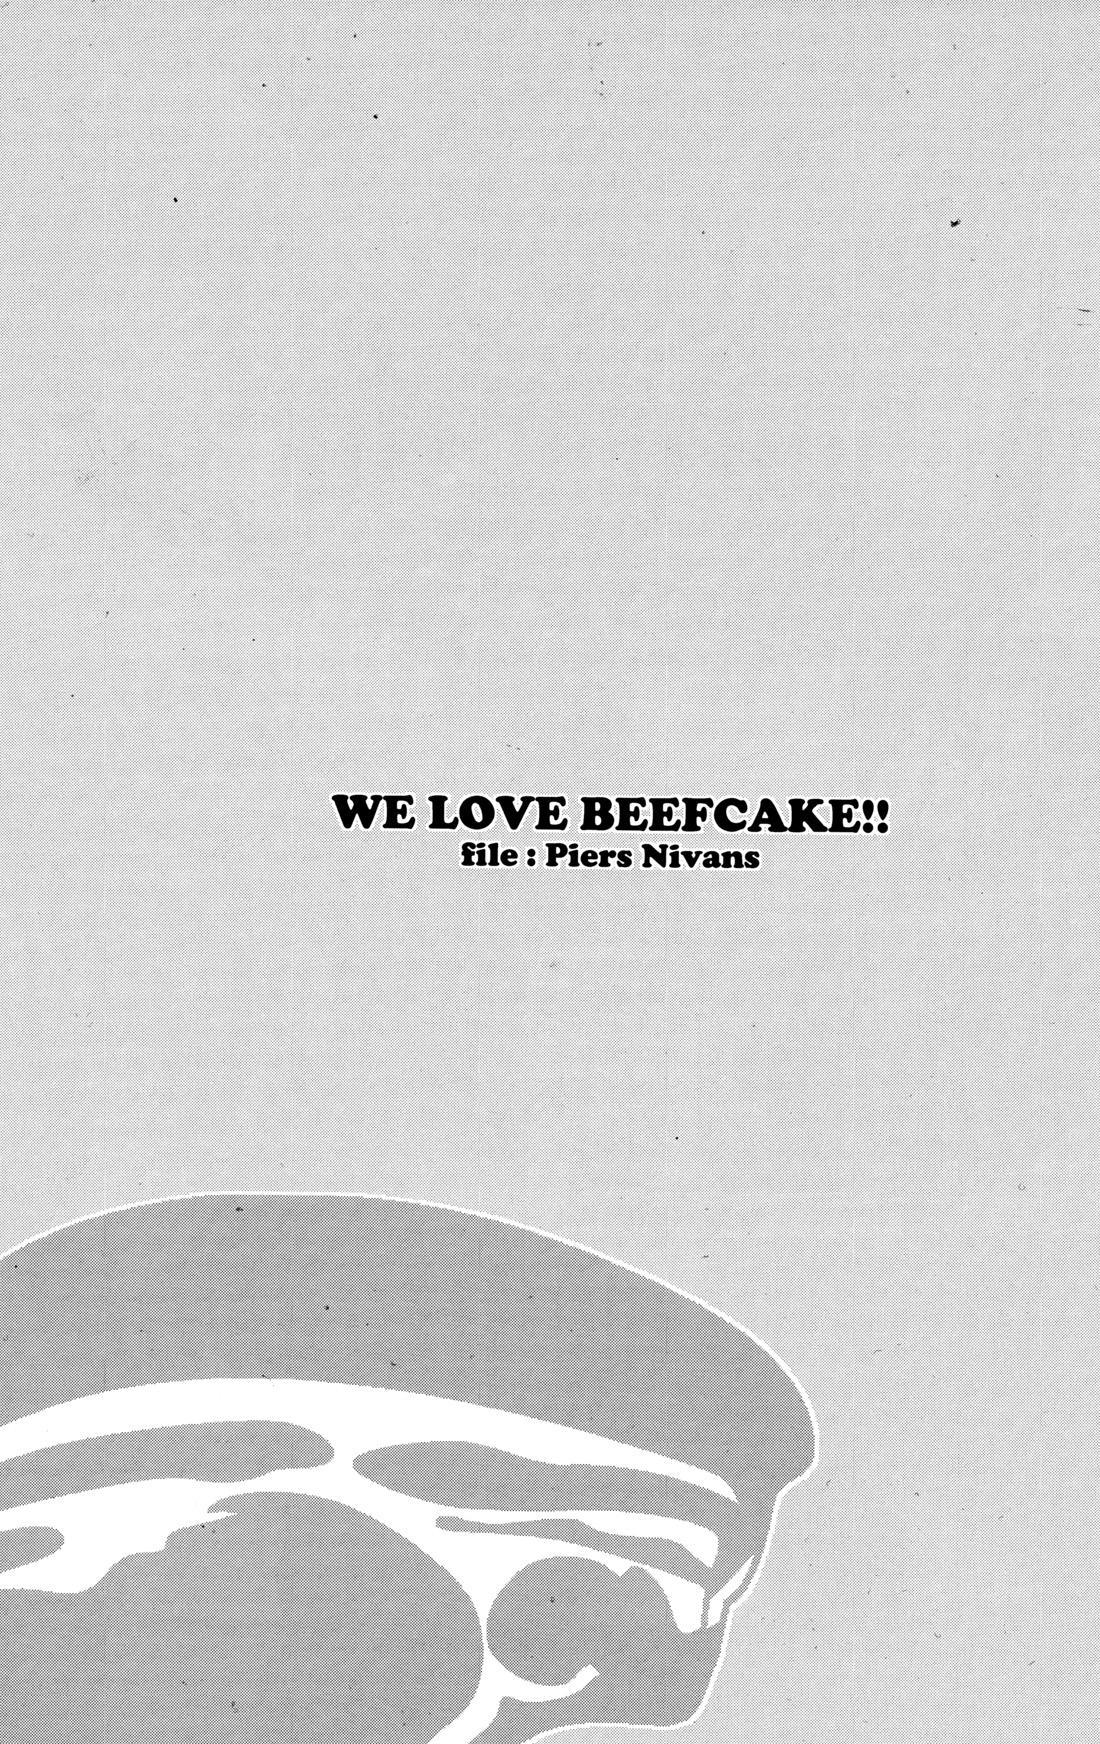 Oinarioimo:We love beefcake 1